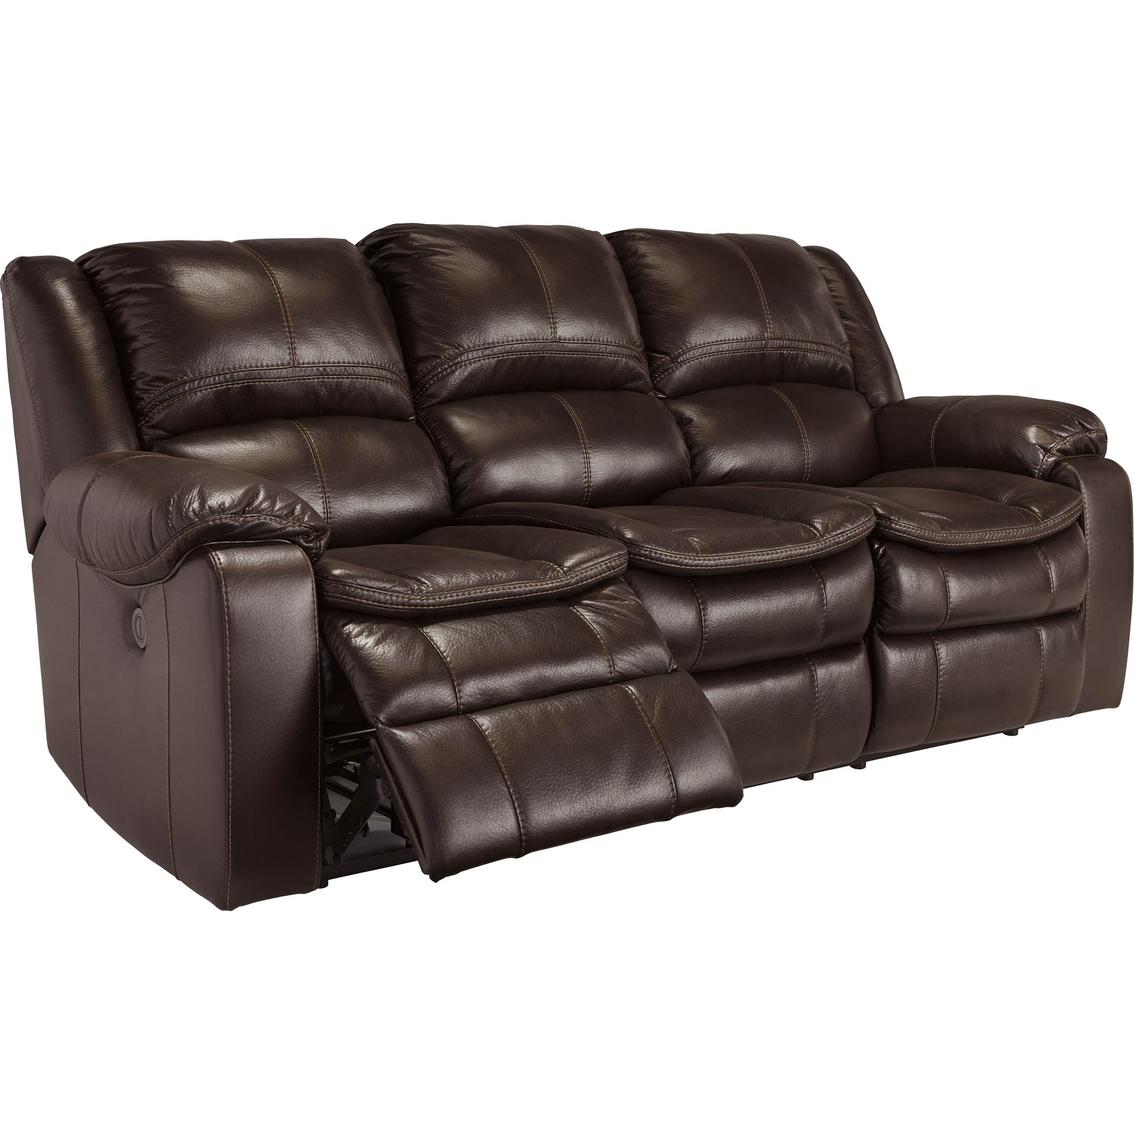 Ashley Longknight Double Reclining Sofa Brown Sofas